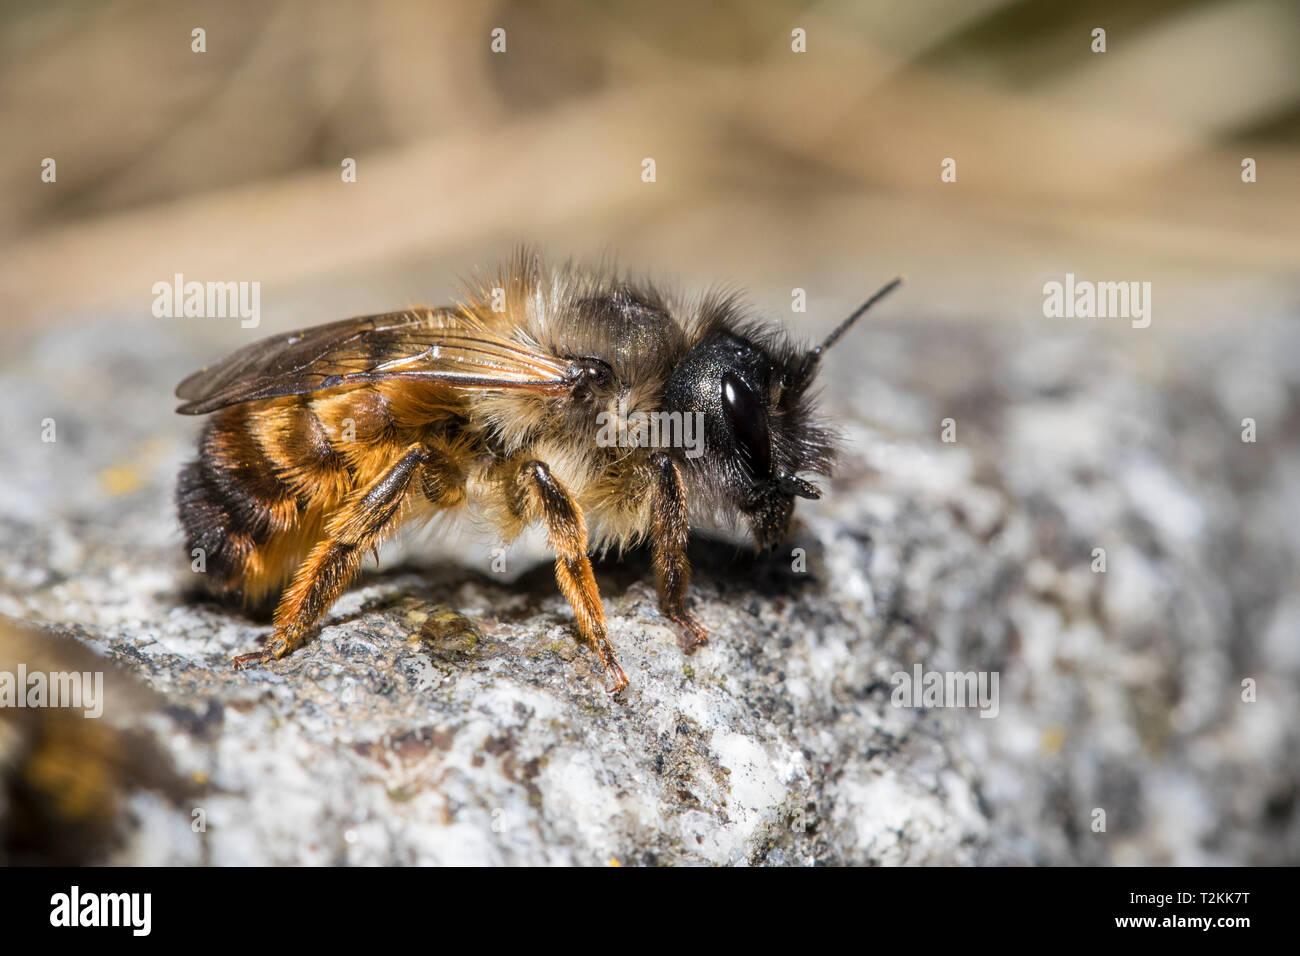 Rote Mauerbiene, Osmia bicornis, red mason bee - Stock Image